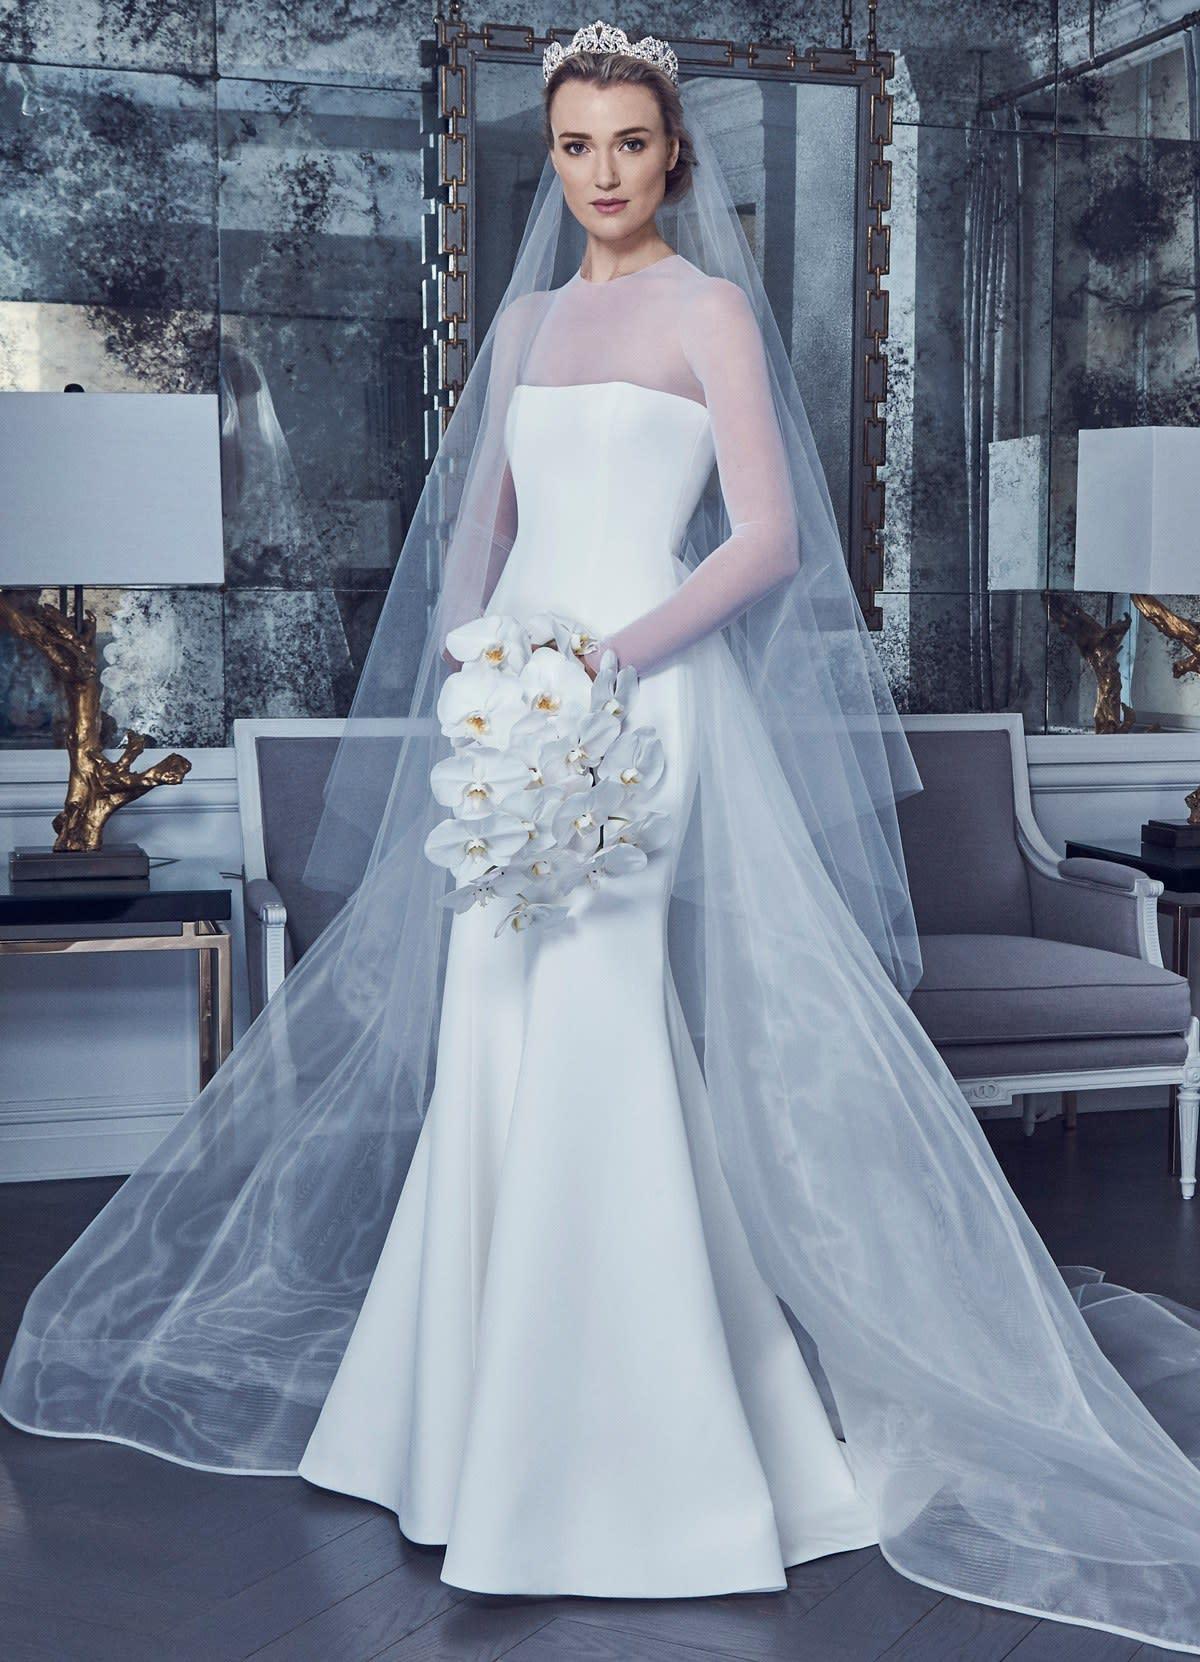 Emejing Princess Fiona Wedding Dress Images - Styles & Ideas 2018 ...